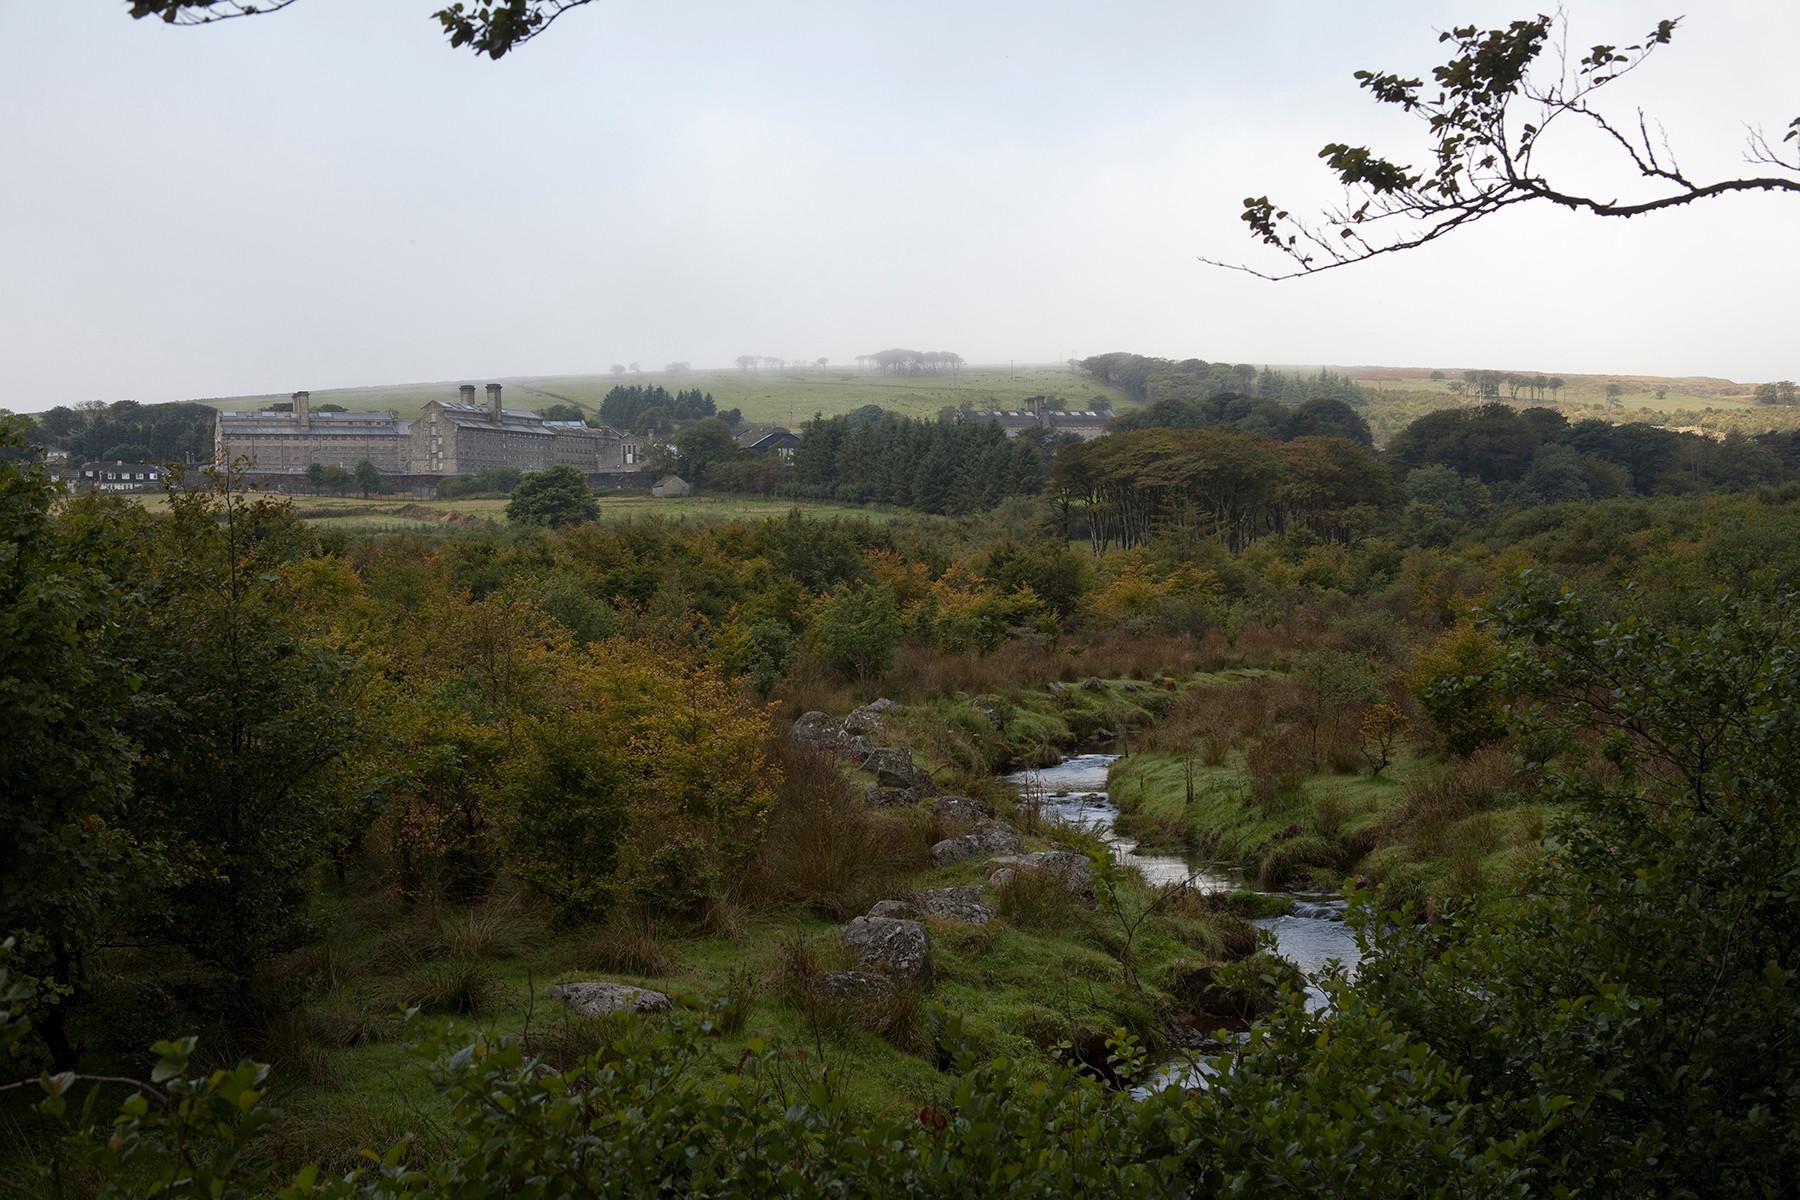 England 2013 (Dartmoor, Princetown)